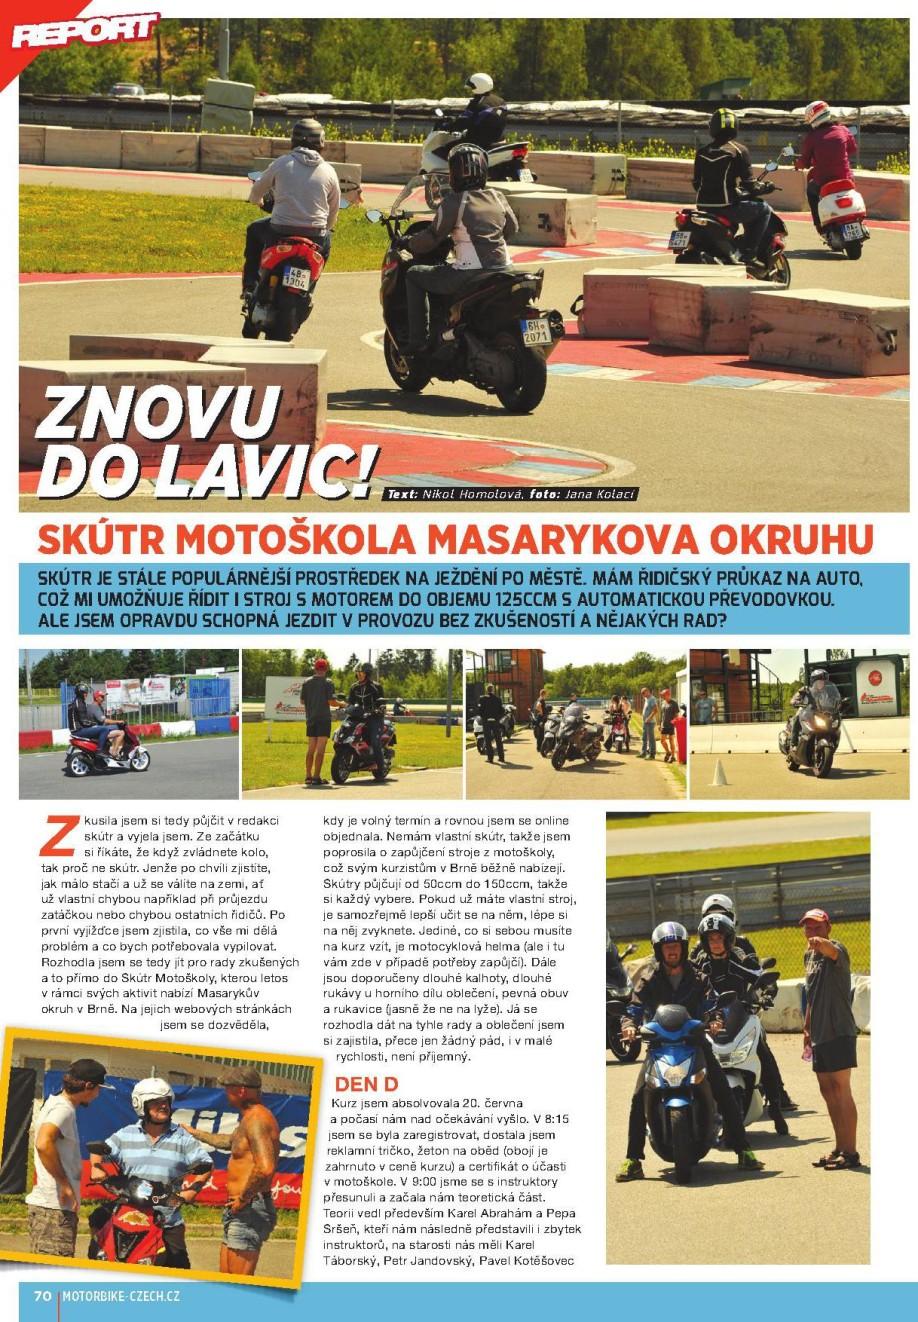 Motorbike_07-2017_36